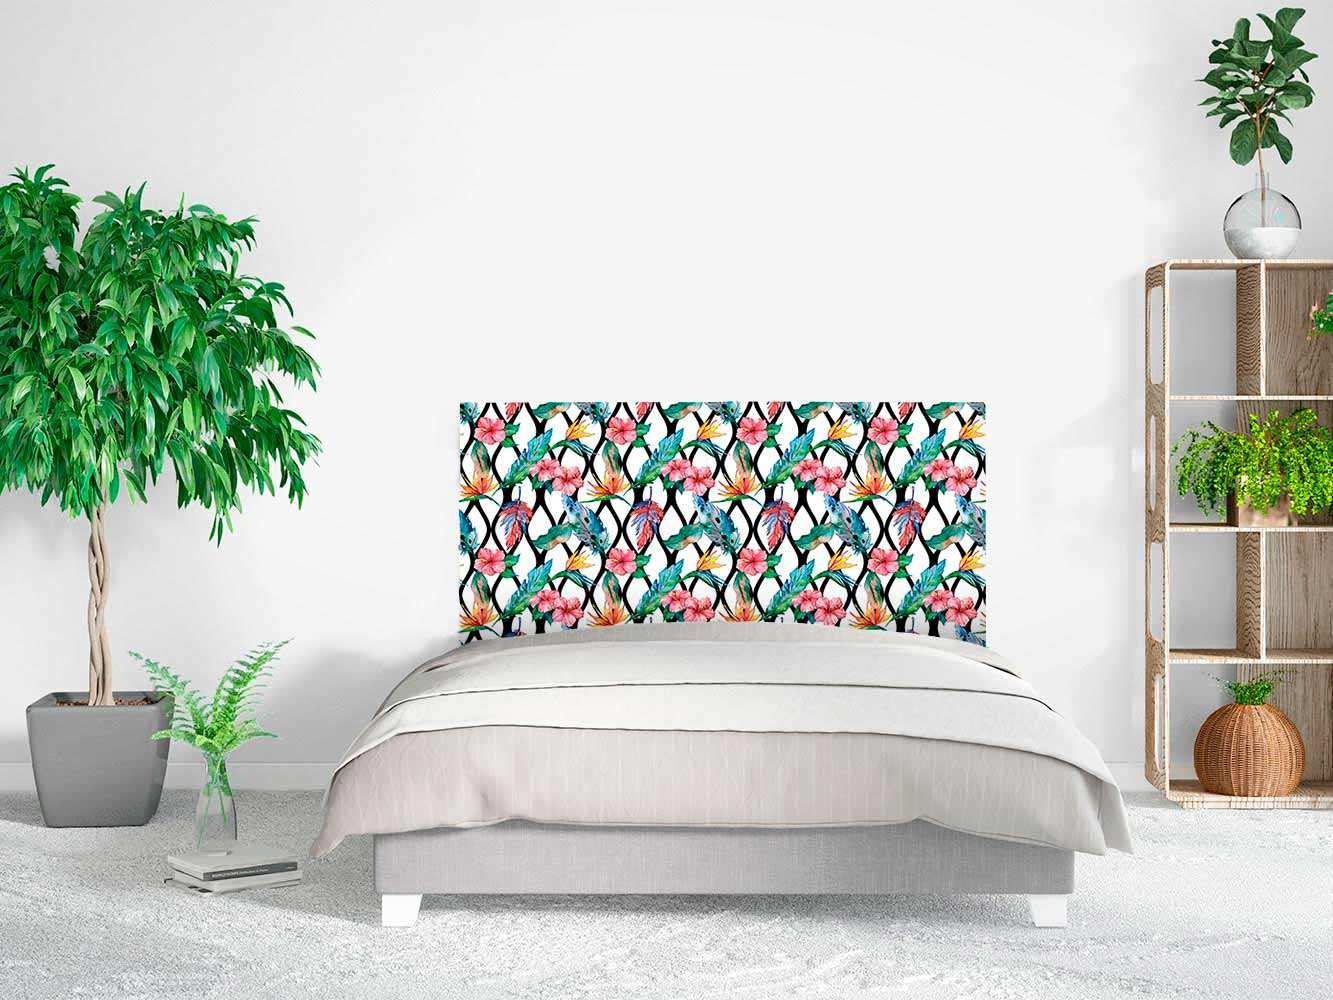 Cabecero Cama Arte Floral Multicolor | Carteles XXL - Impresión carteleria publicitaria